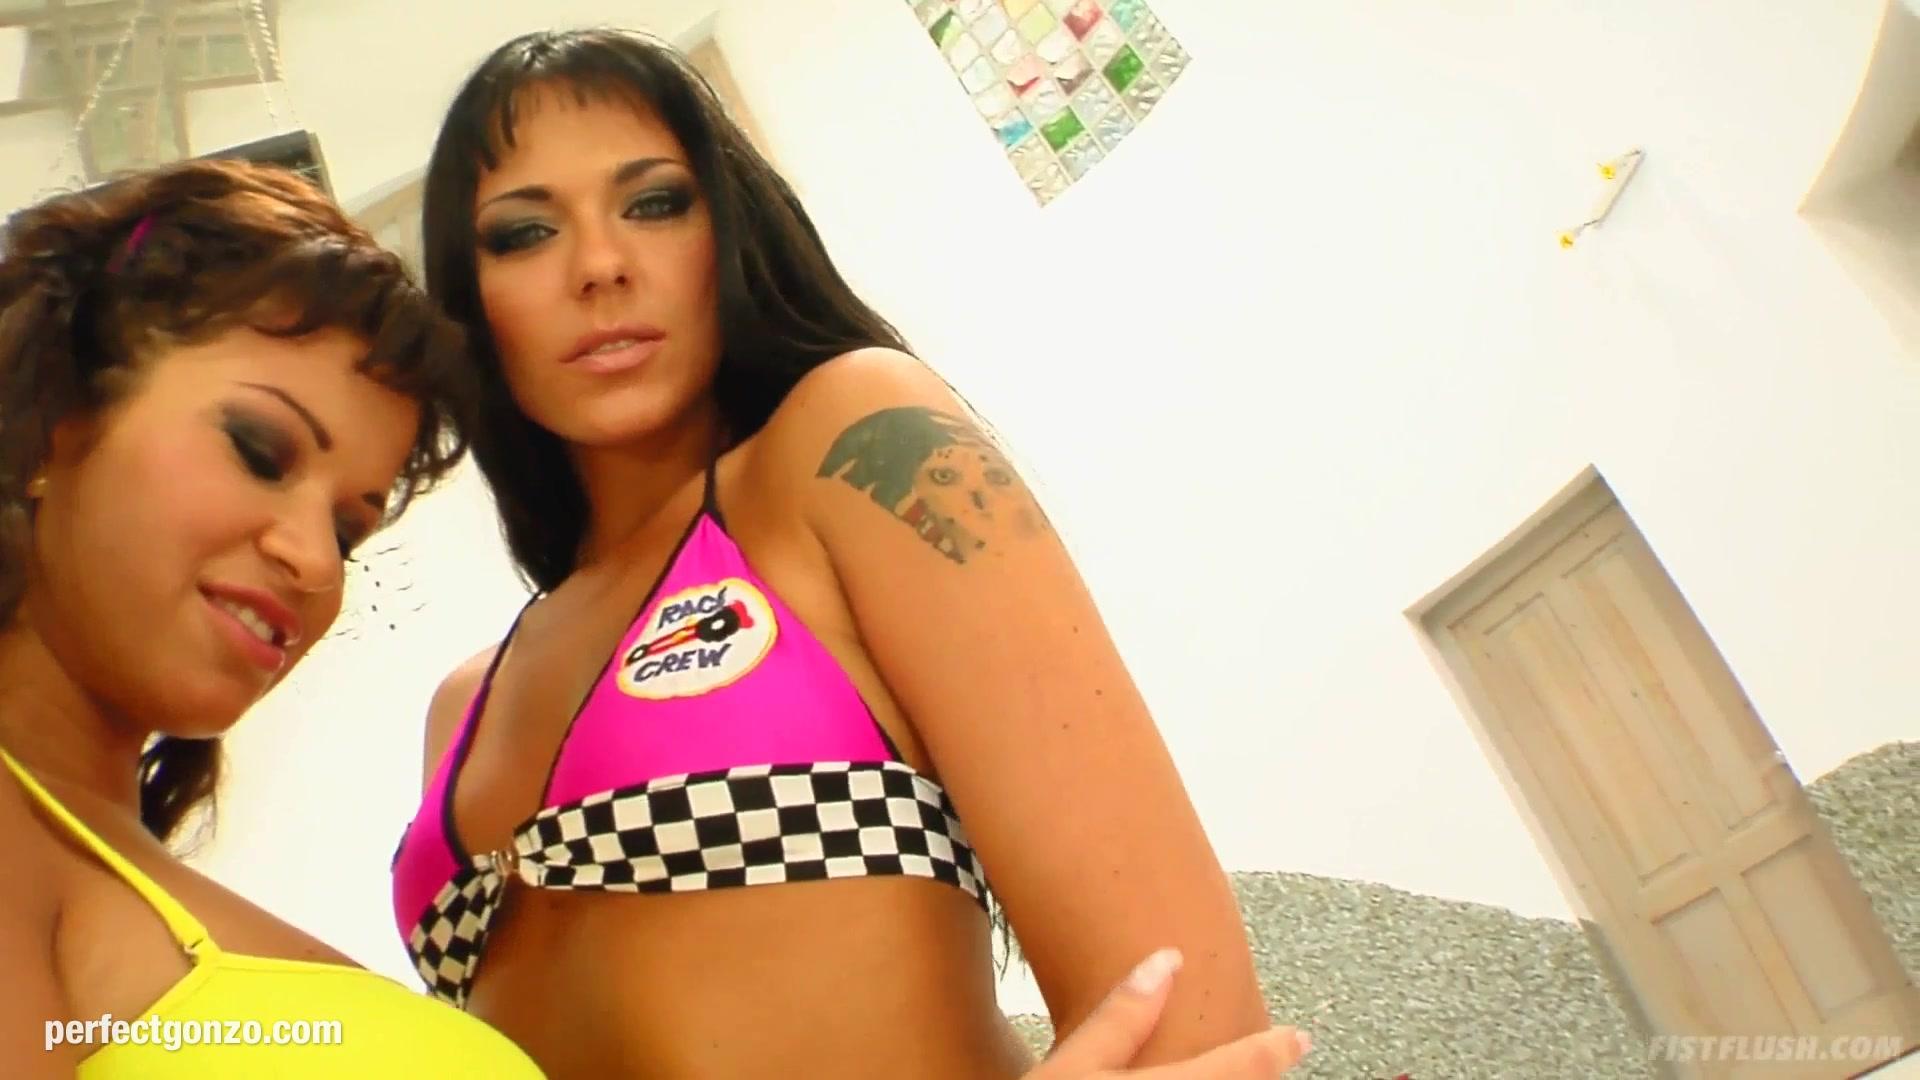 Simona - Virginia lesbian fisting by FistFlush